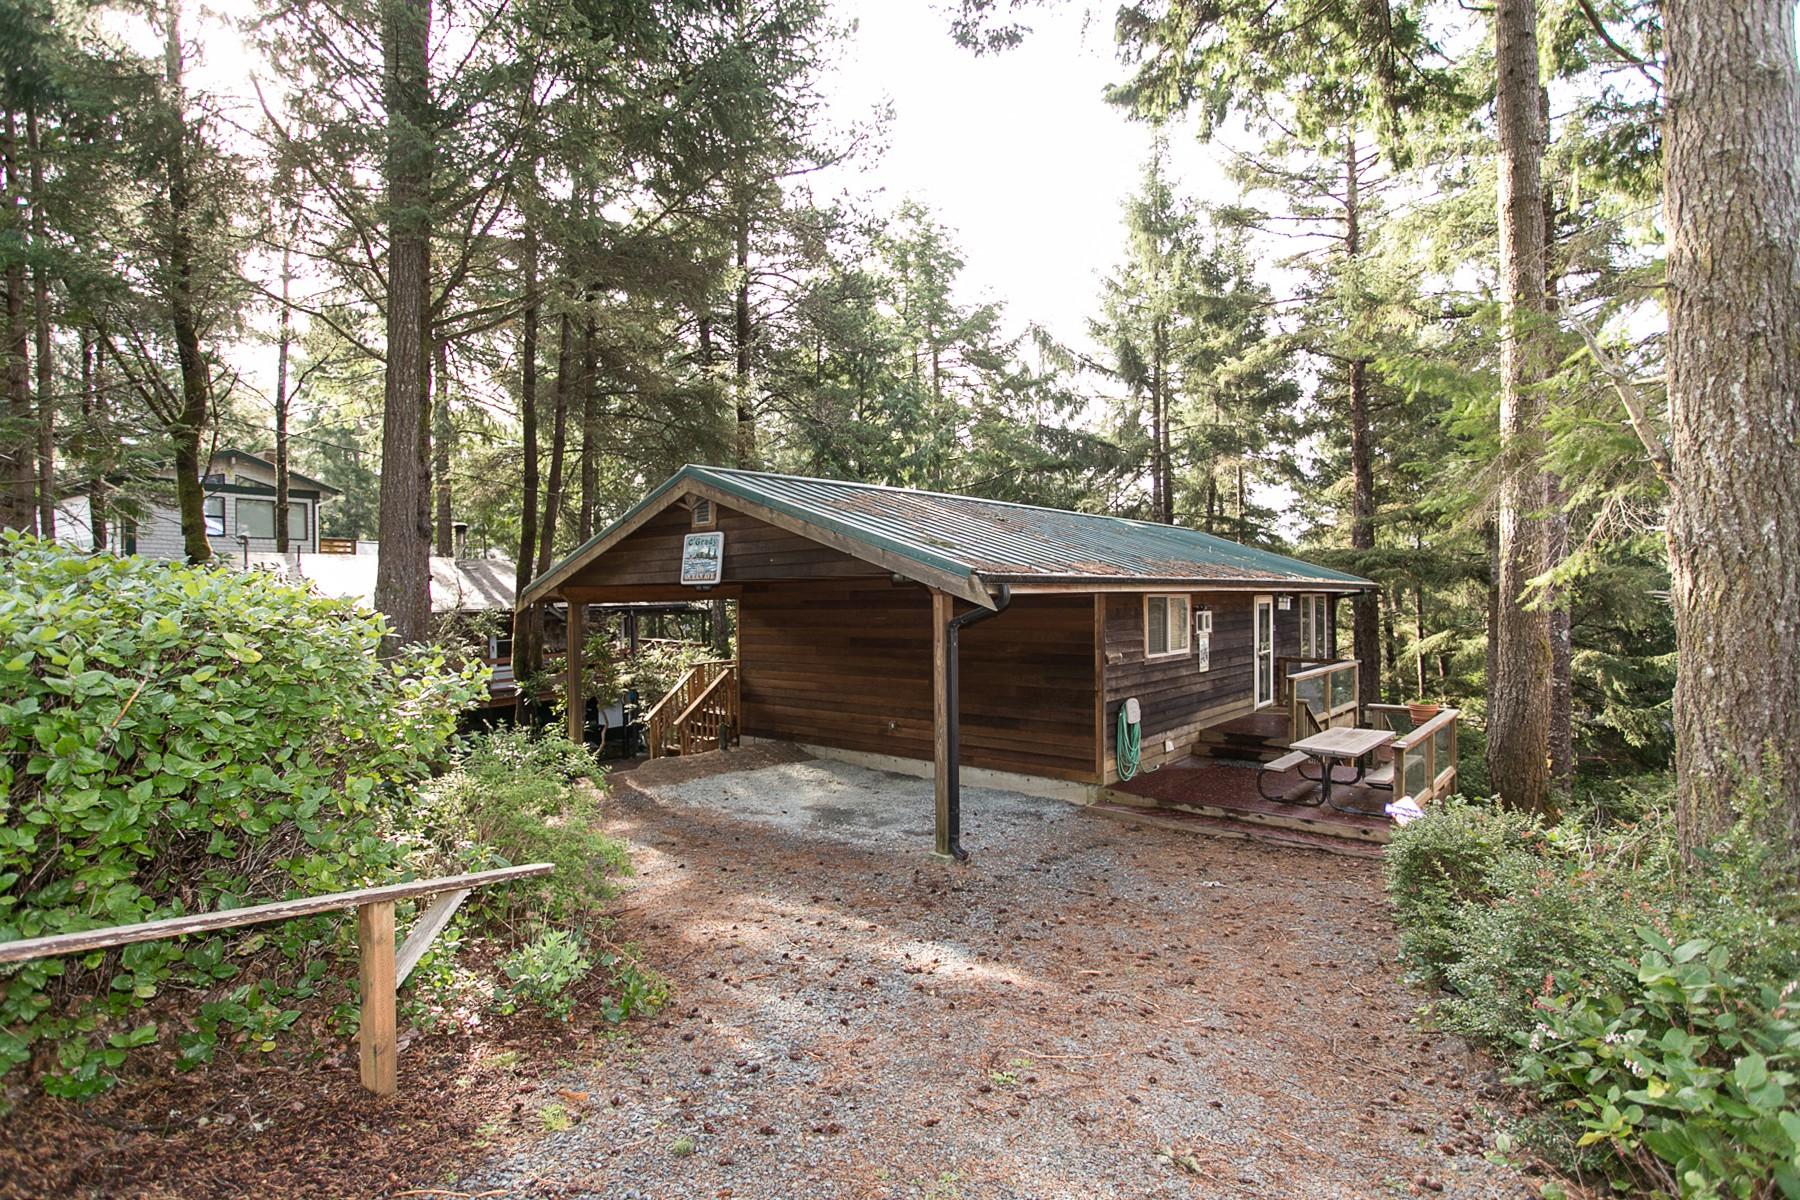 Single Family Home for Sale at Versatile Beach House 106 Ocean Ave. Manzanita, Oregon 97130 United States